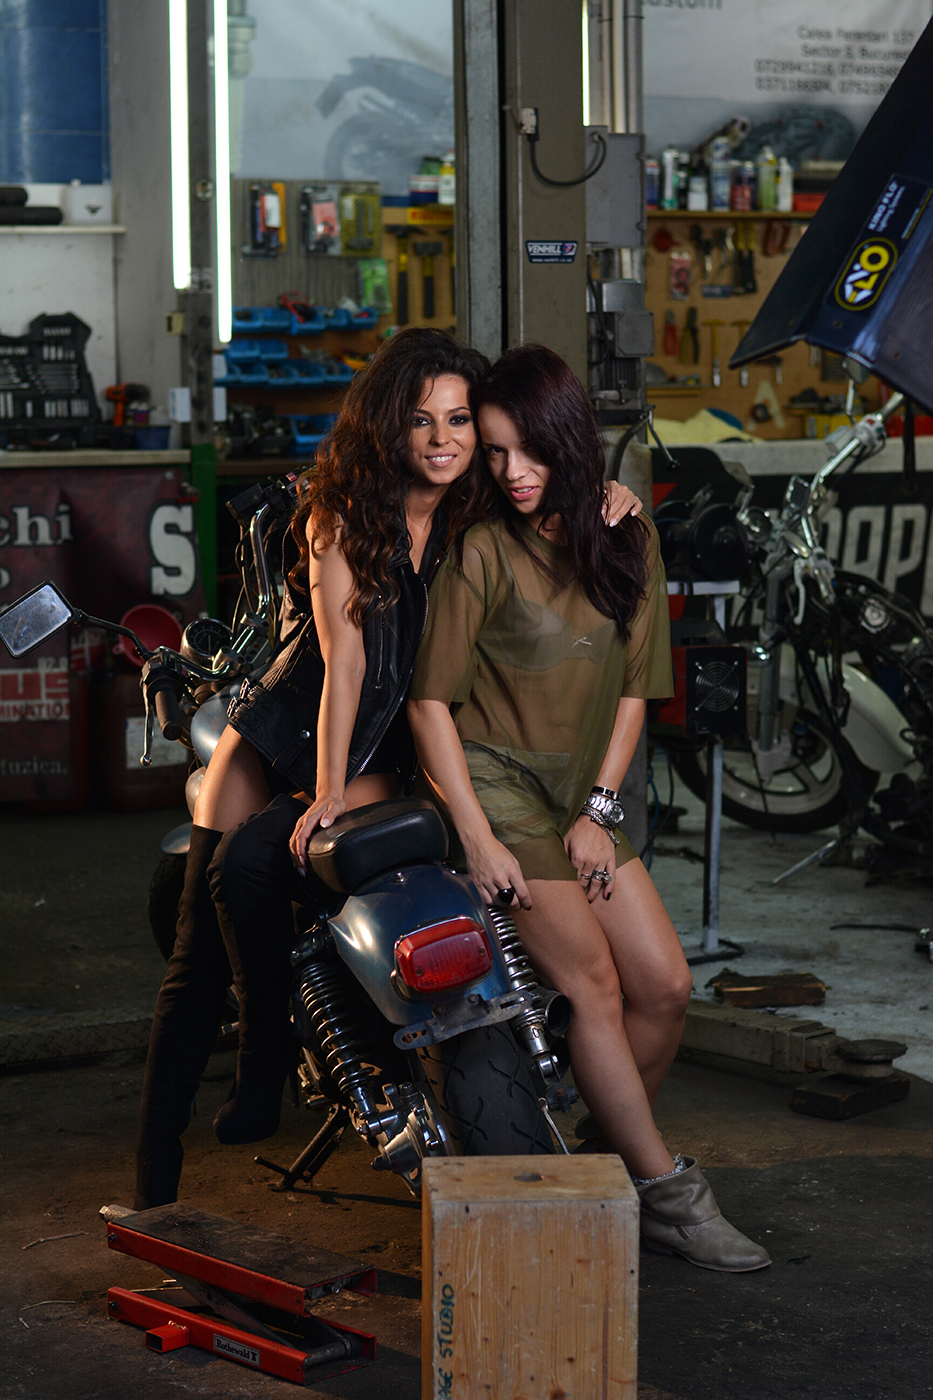 ami-niste-dragoste-videoclip-2016-014